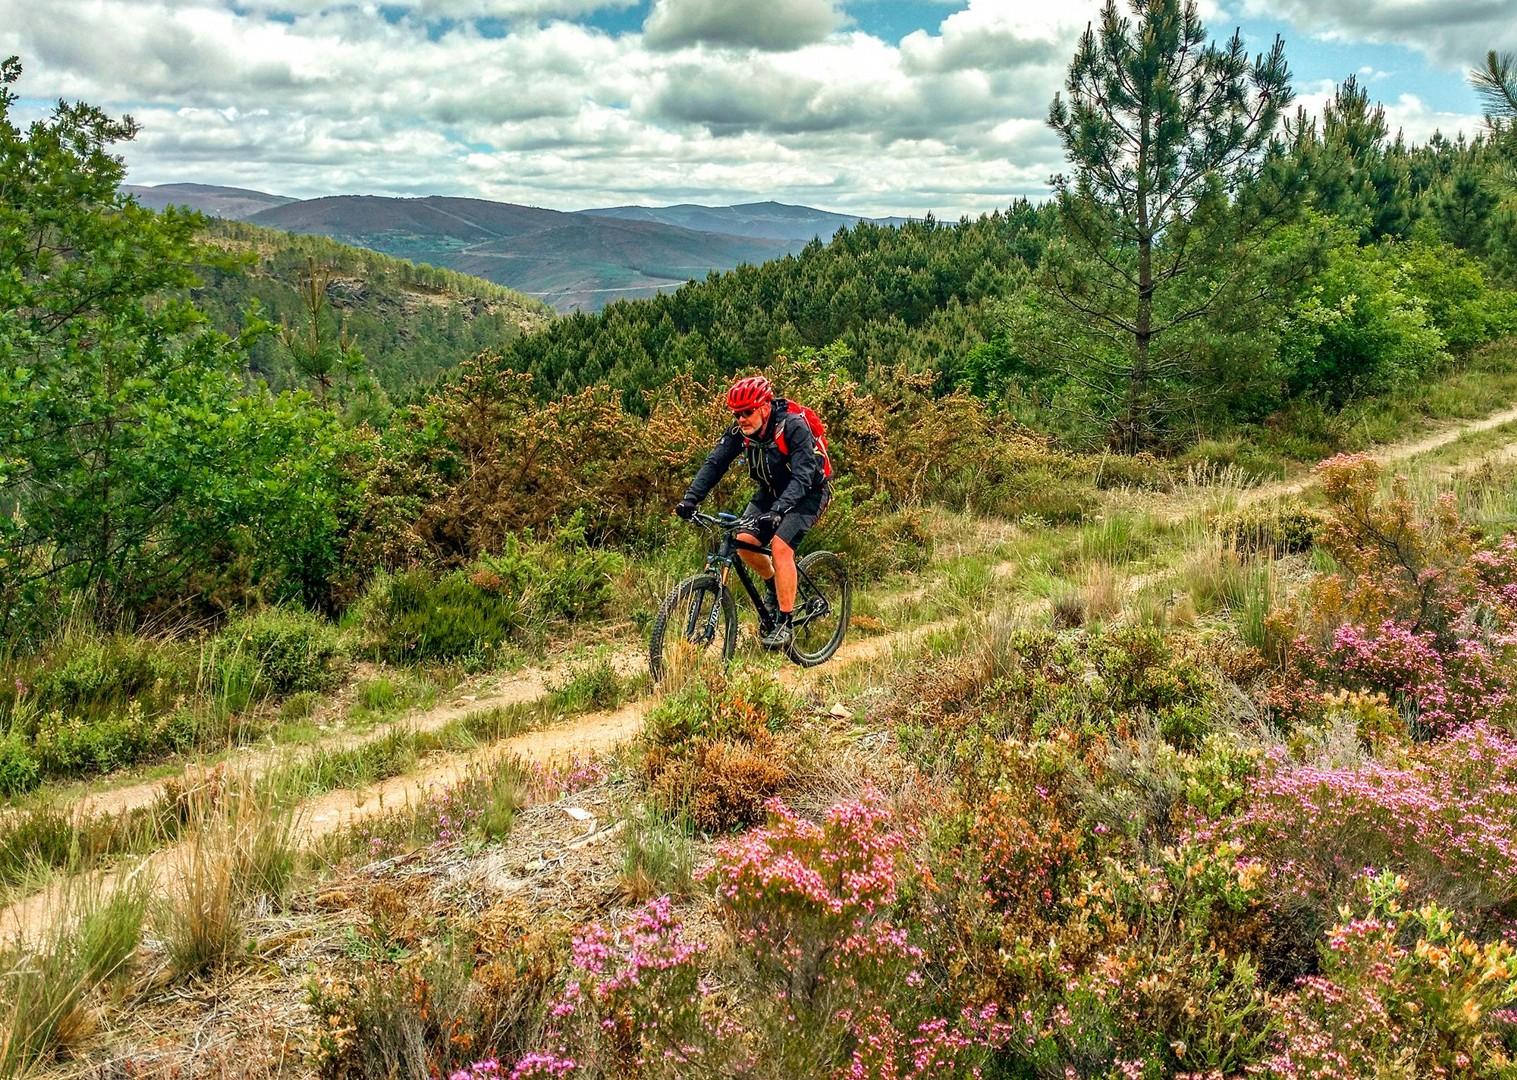 IMG_20170518_134845537_HDR.jpg - Spain - Ruta de la Plata - Guided Mountain Bike Holiday - Mountain Biking